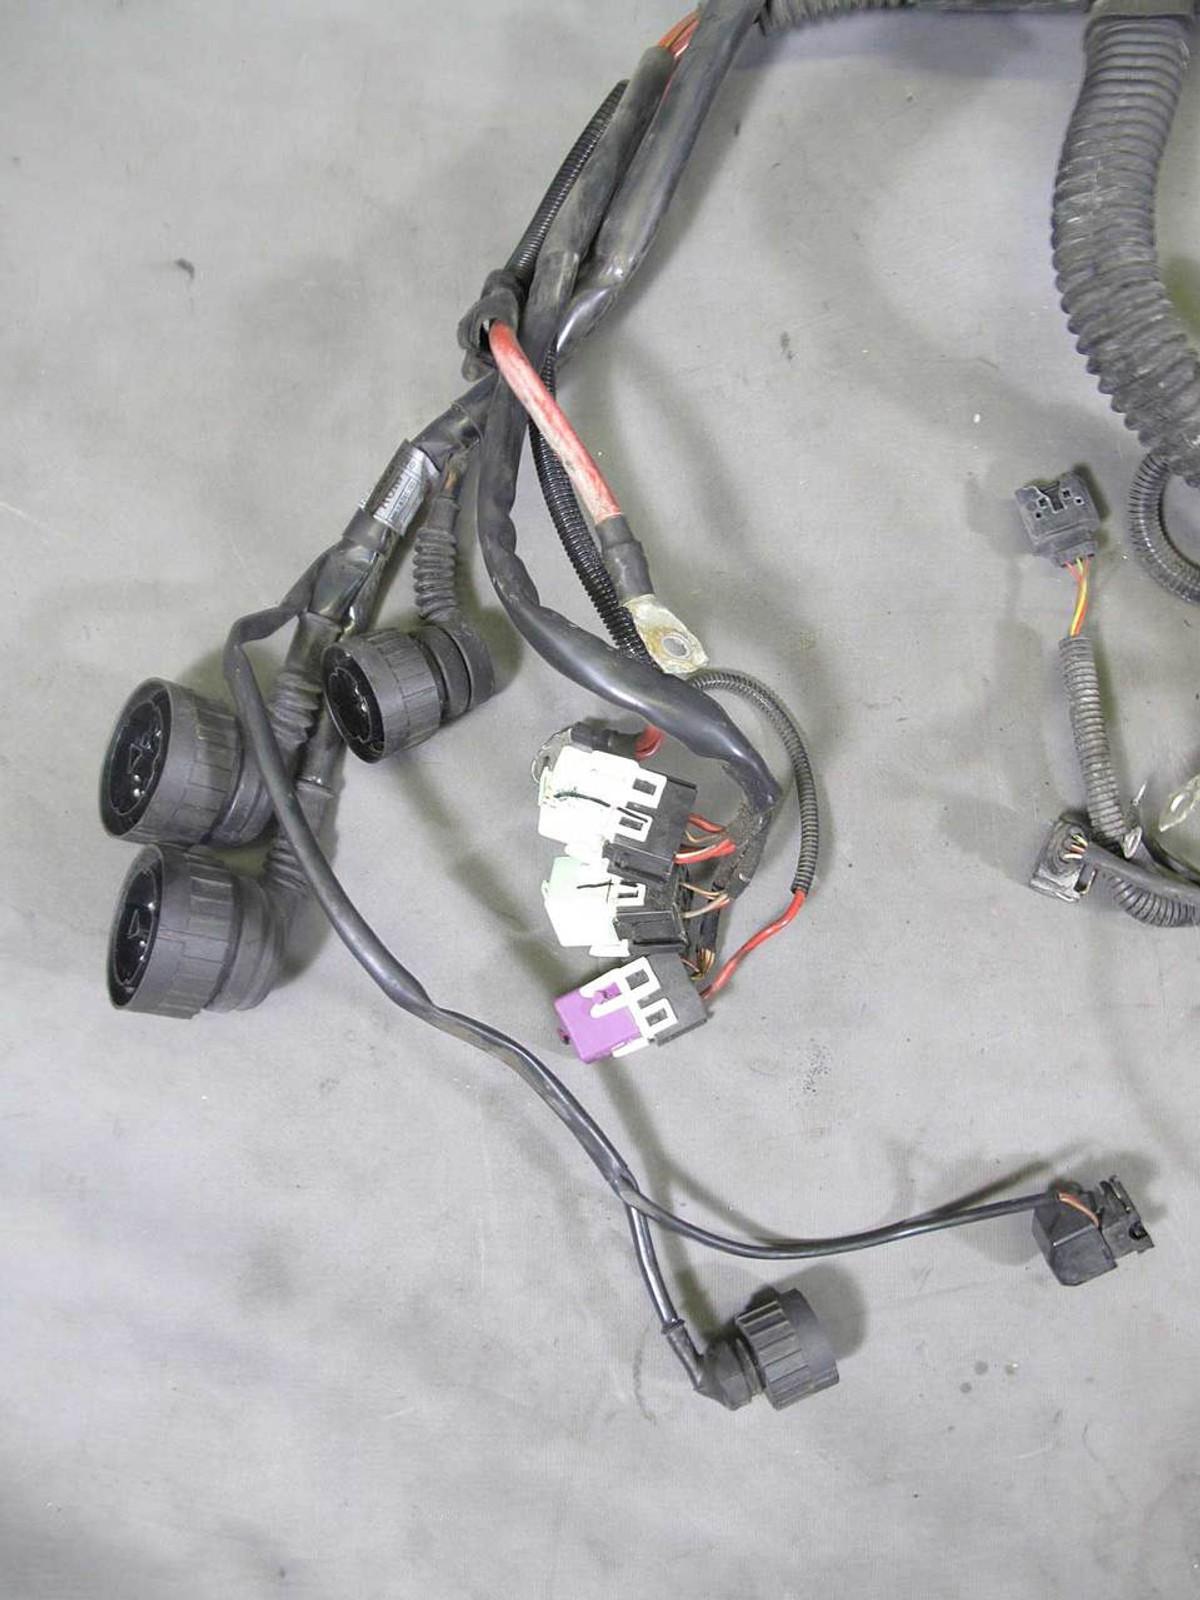 cdn11 bigcommerce com s hkk7s images stencil 1600x bmw e36 3 bmw e36 wiring harness racing [ 1200 x 1600 Pixel ]